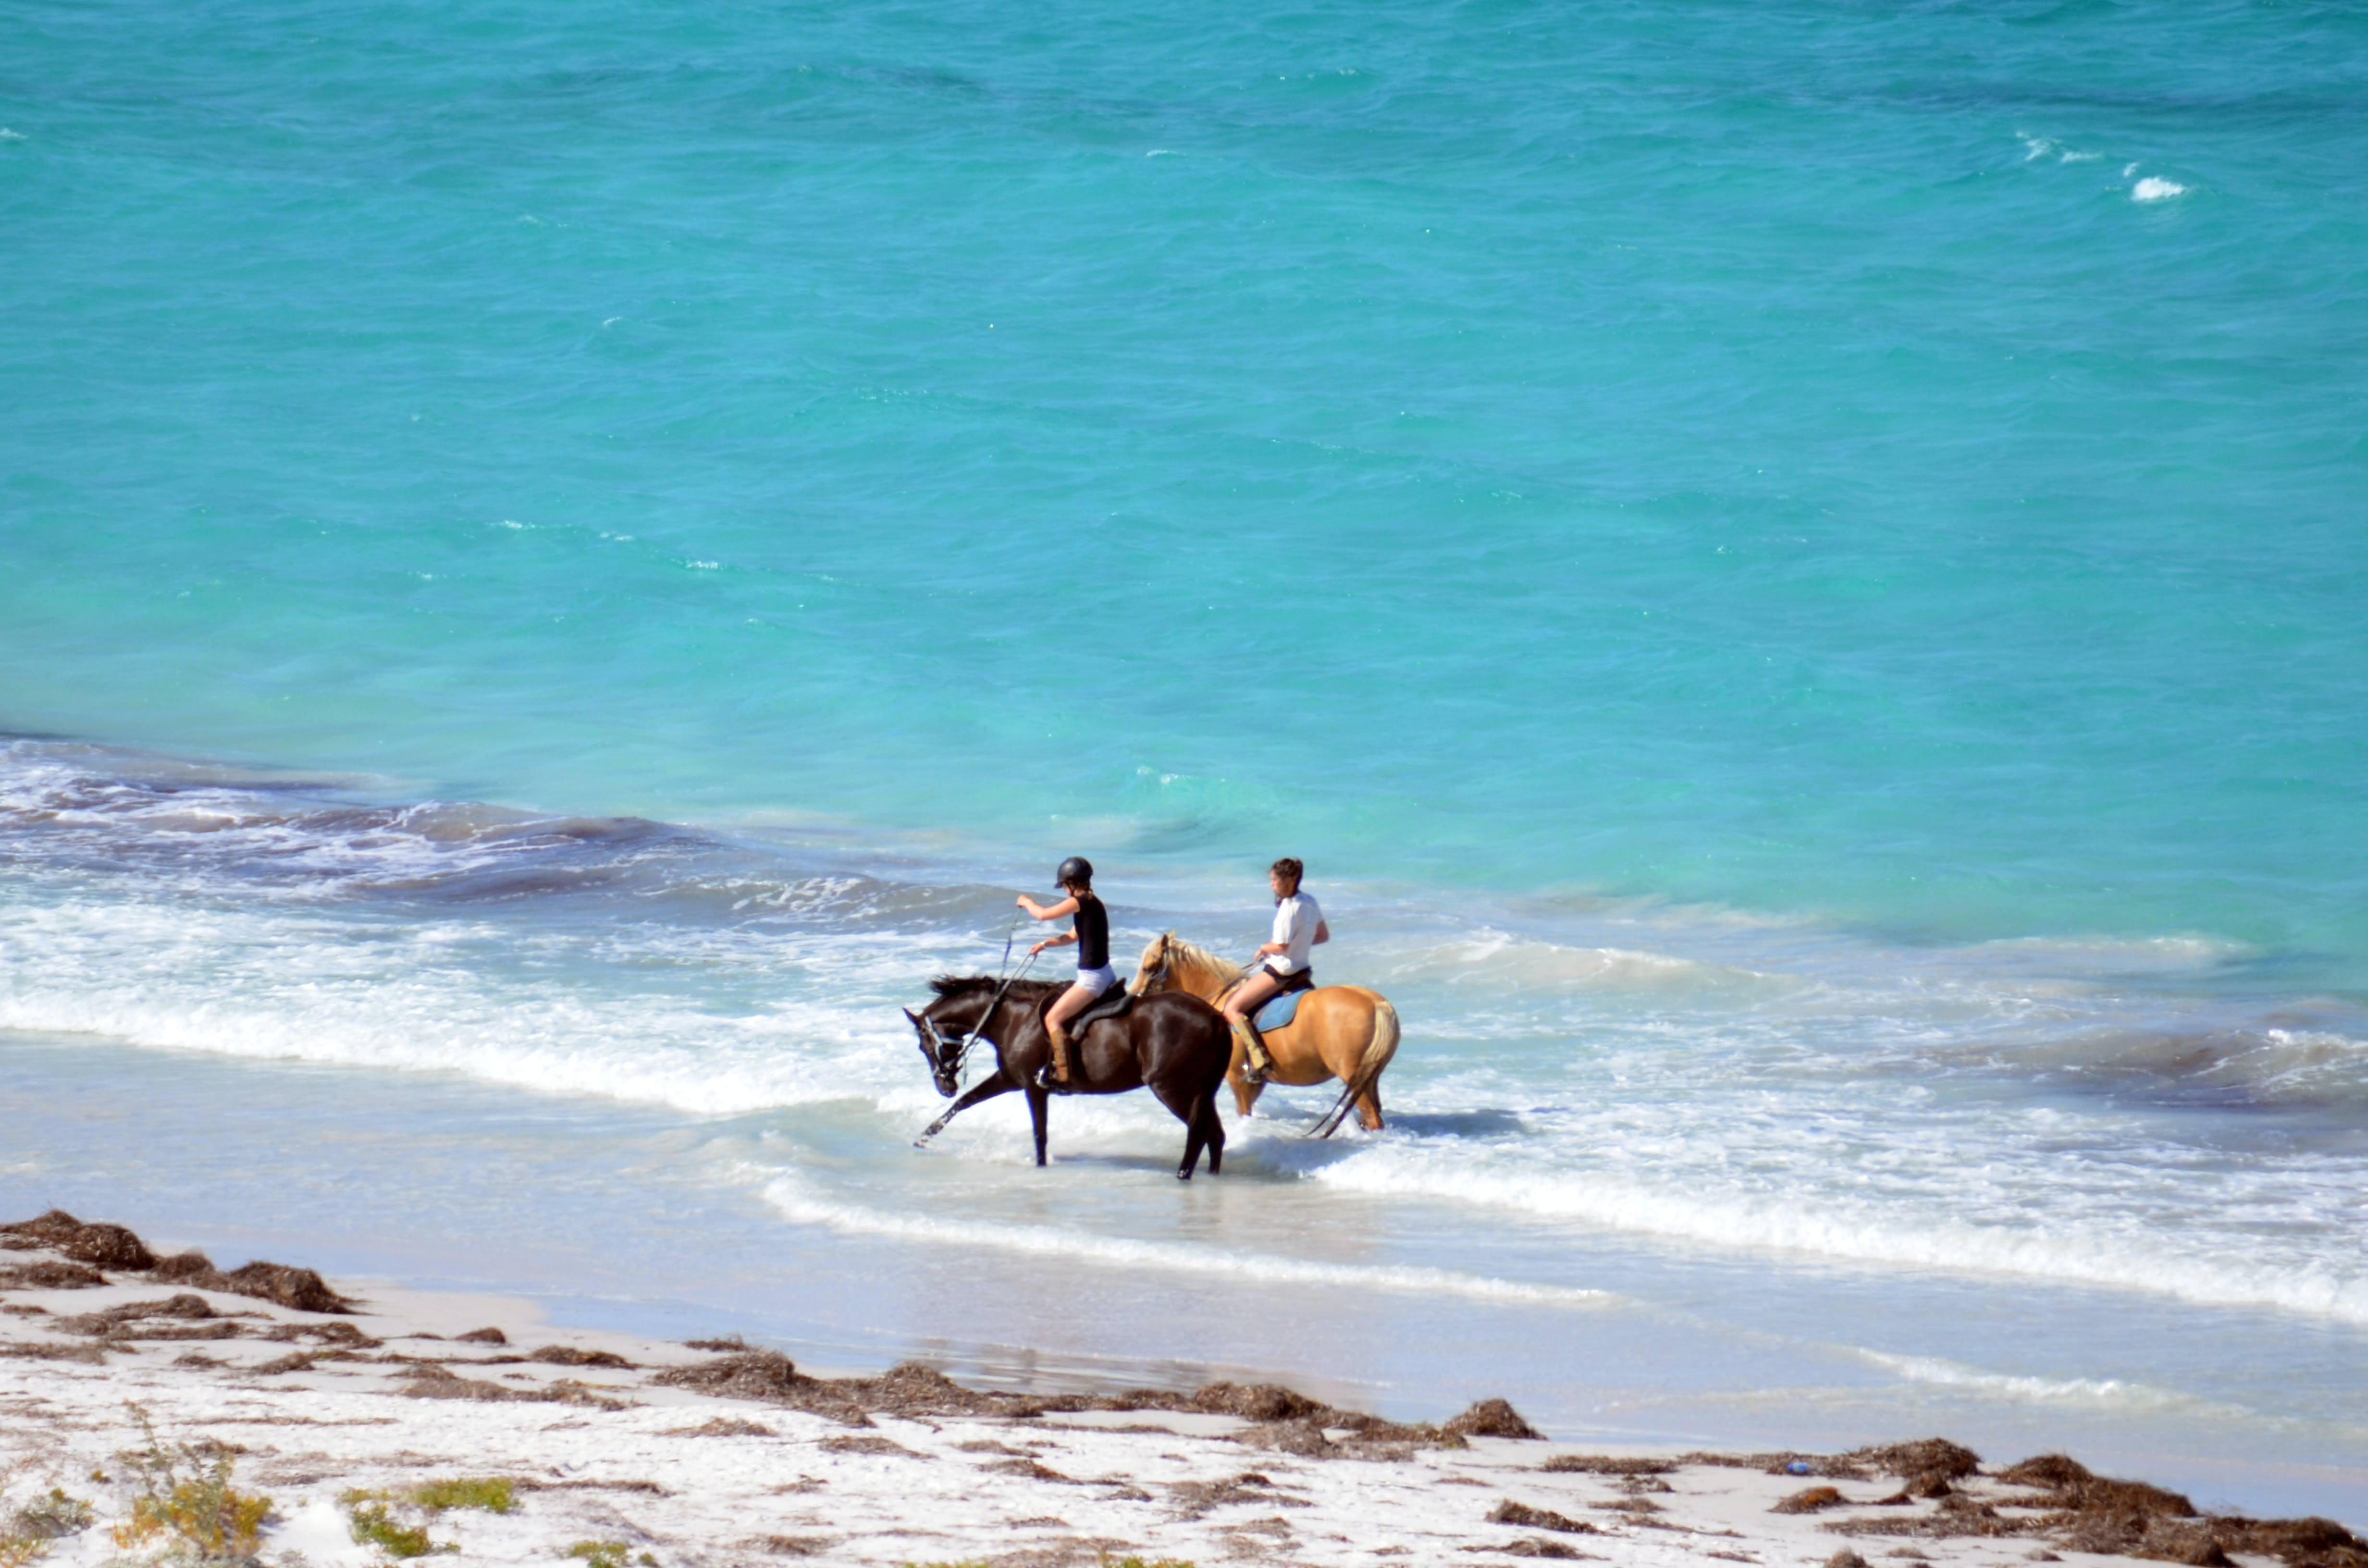 Free stock photo of summer fun, horses walking on beach